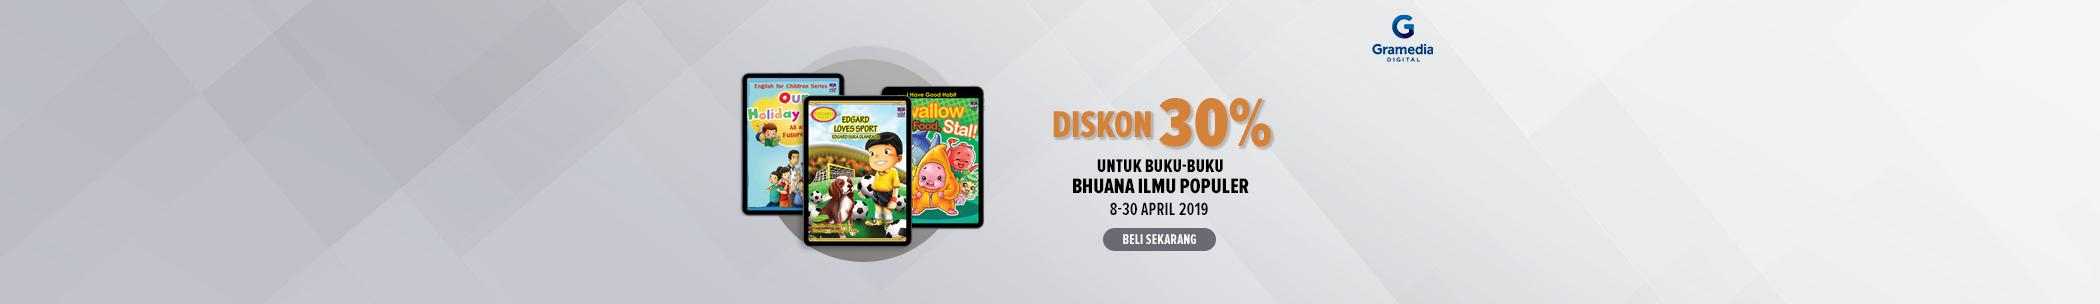 Diskon internal publisher - Bhuana ilmu populer